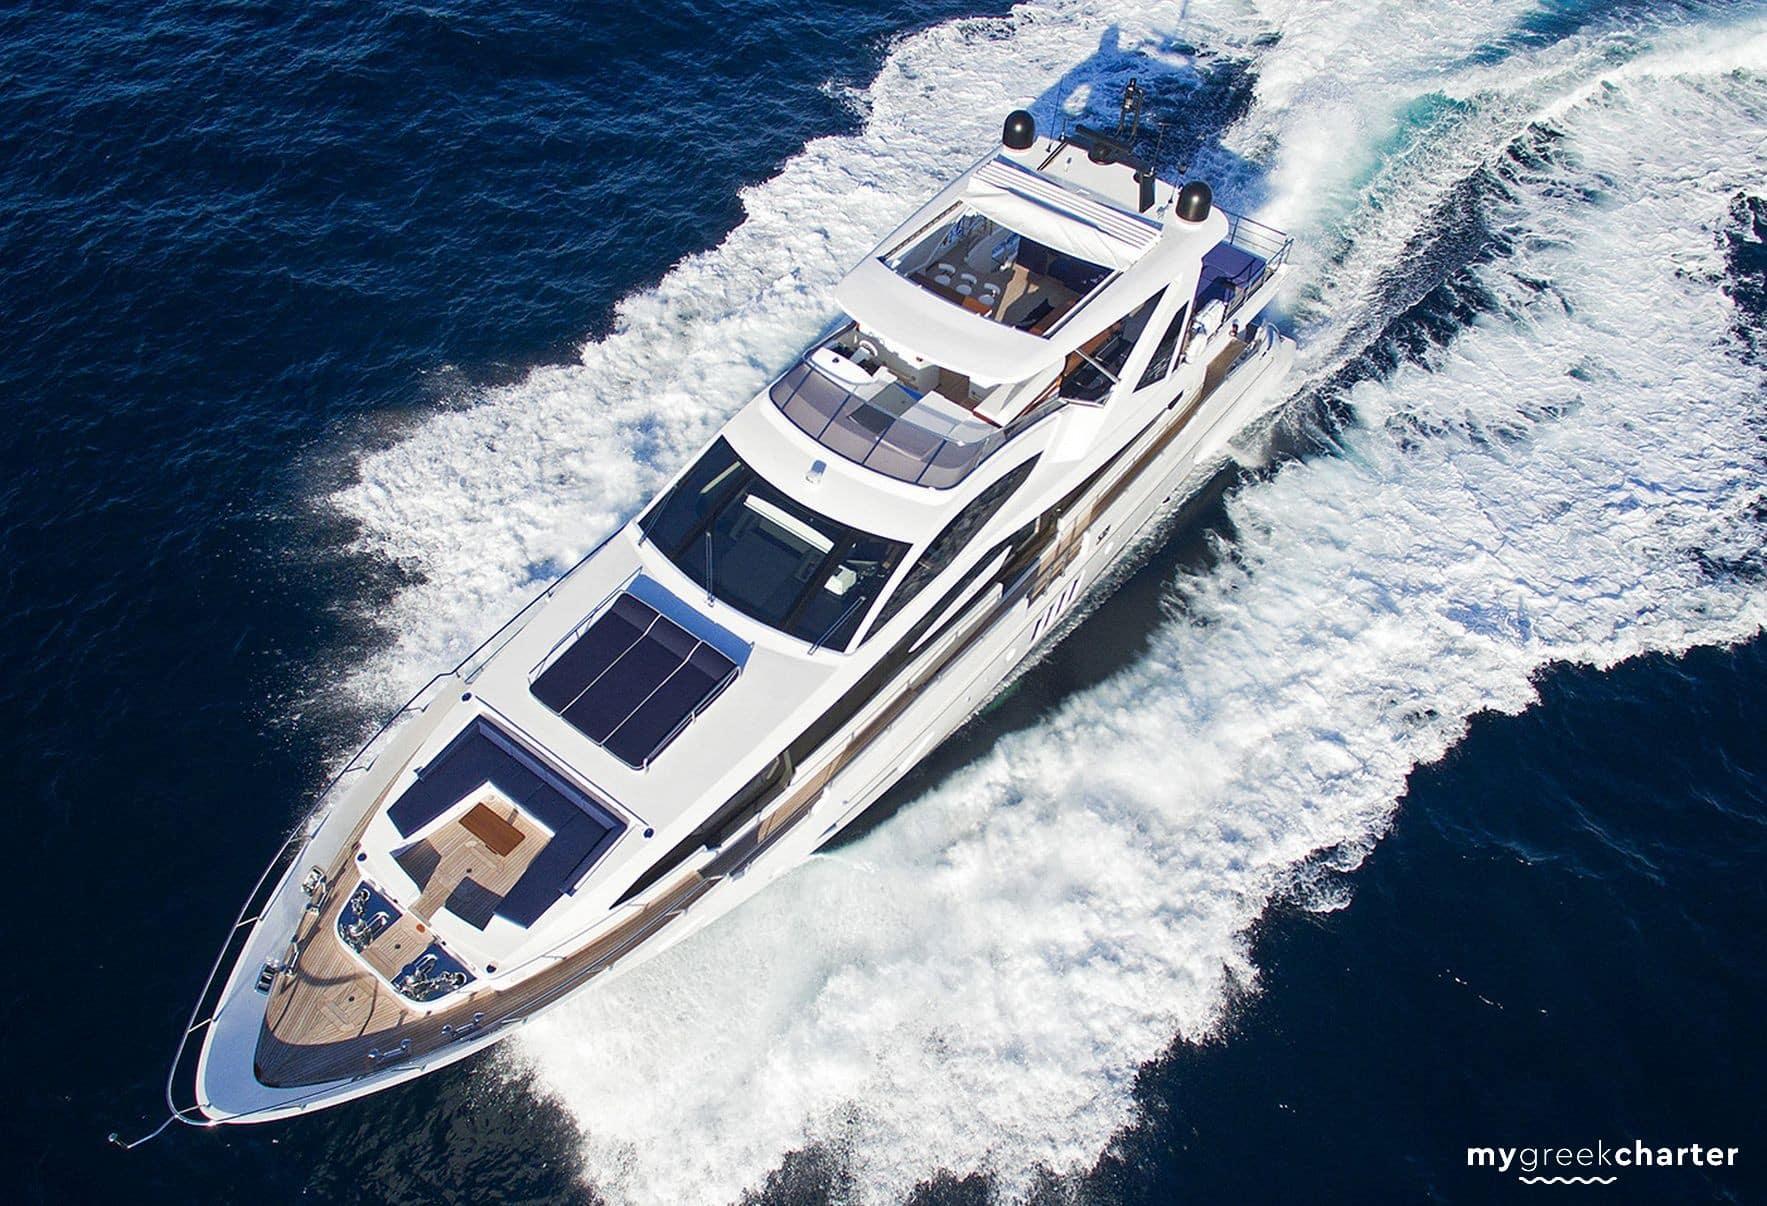 Image of Memories too yacht #2